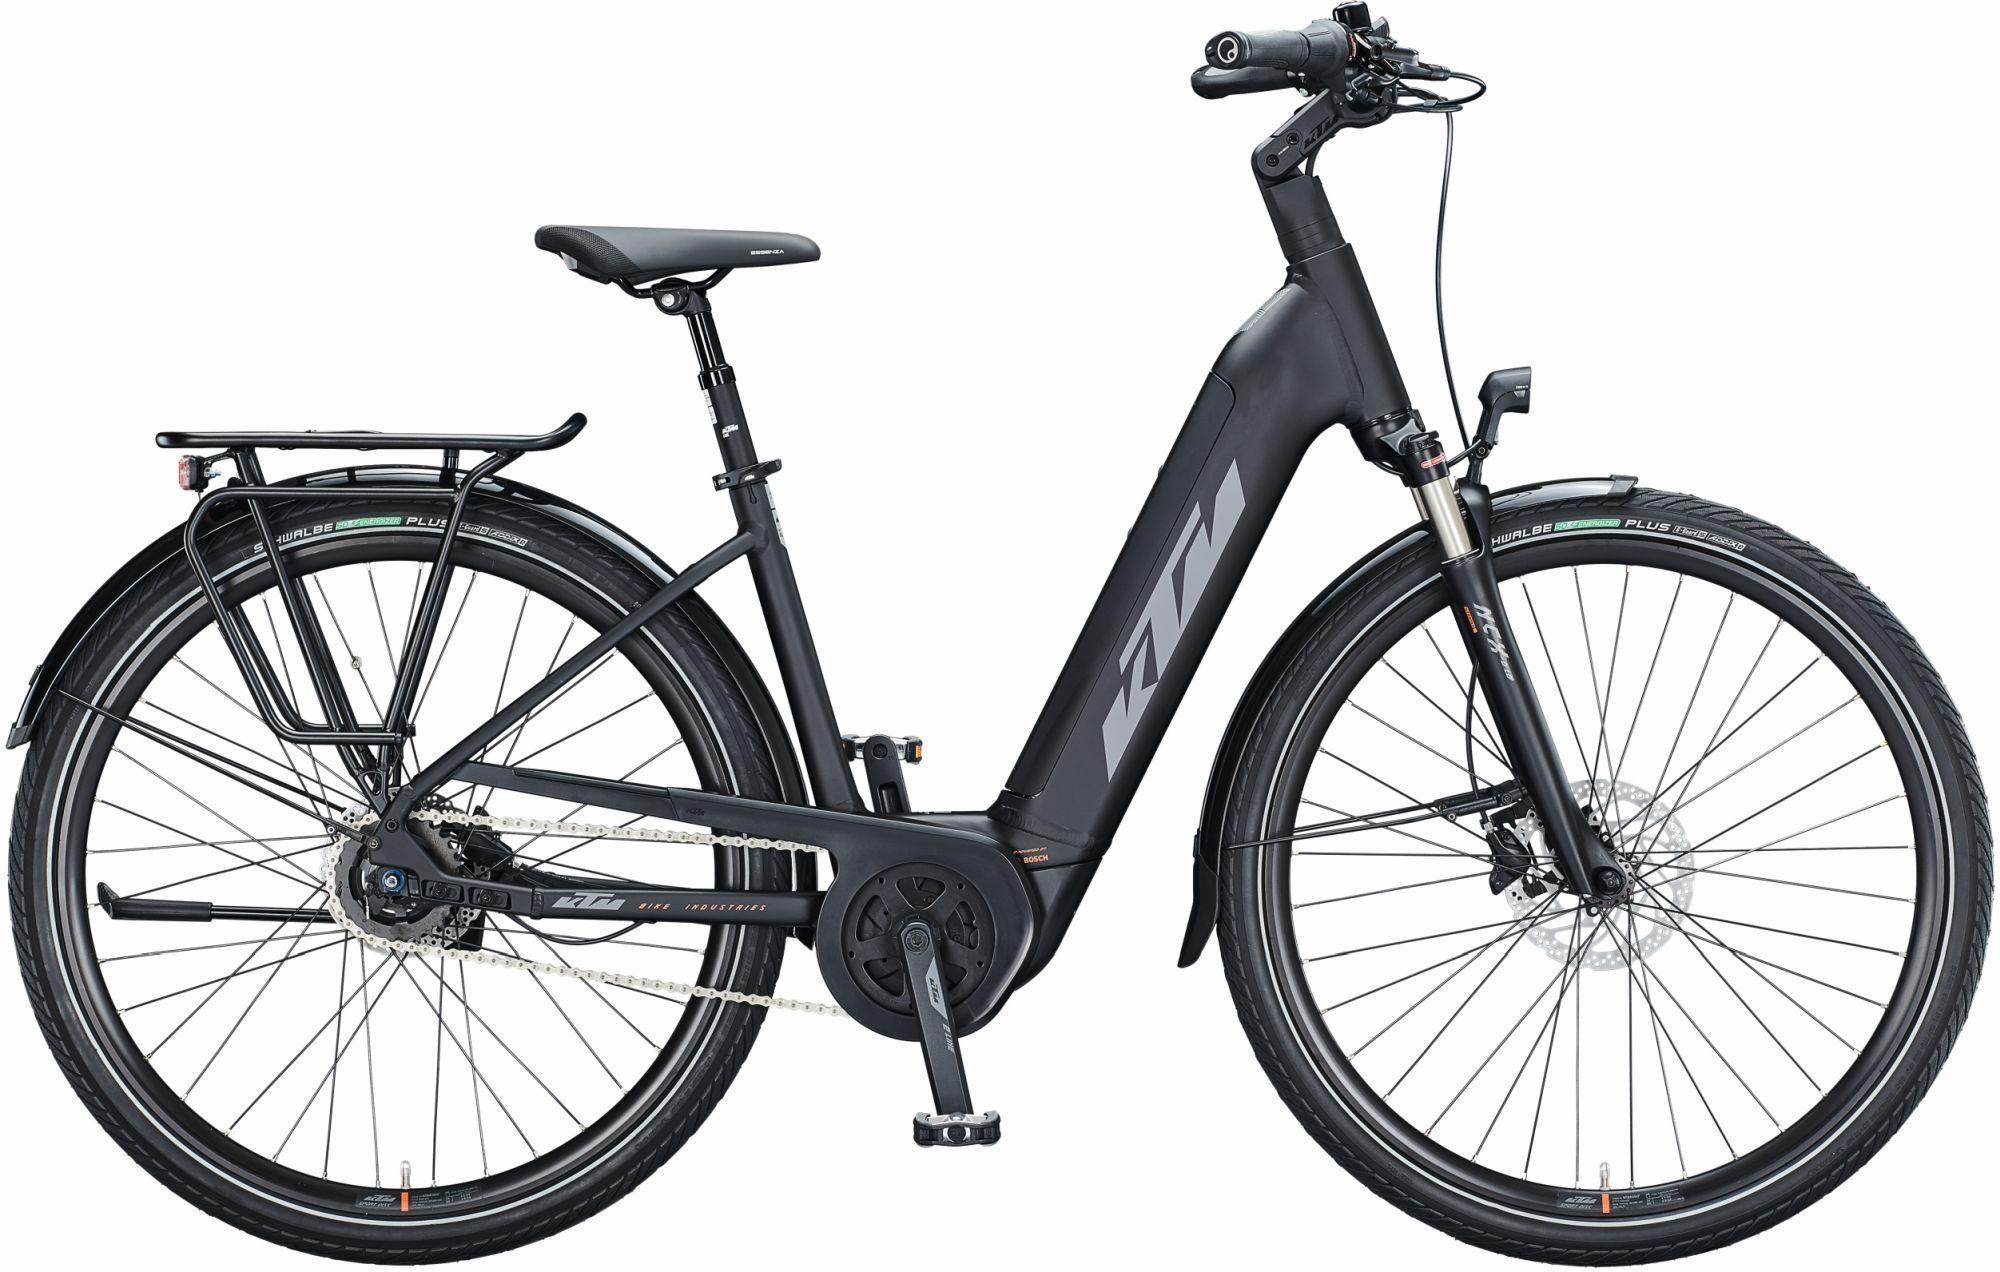 E-Bikes/Citybikes: KTM  MACINA CITY A510 (500 Wh) 5 Gang Nabenschaltung Damenfahrrad Wave Modell 2021 28 Zoll 56 cm